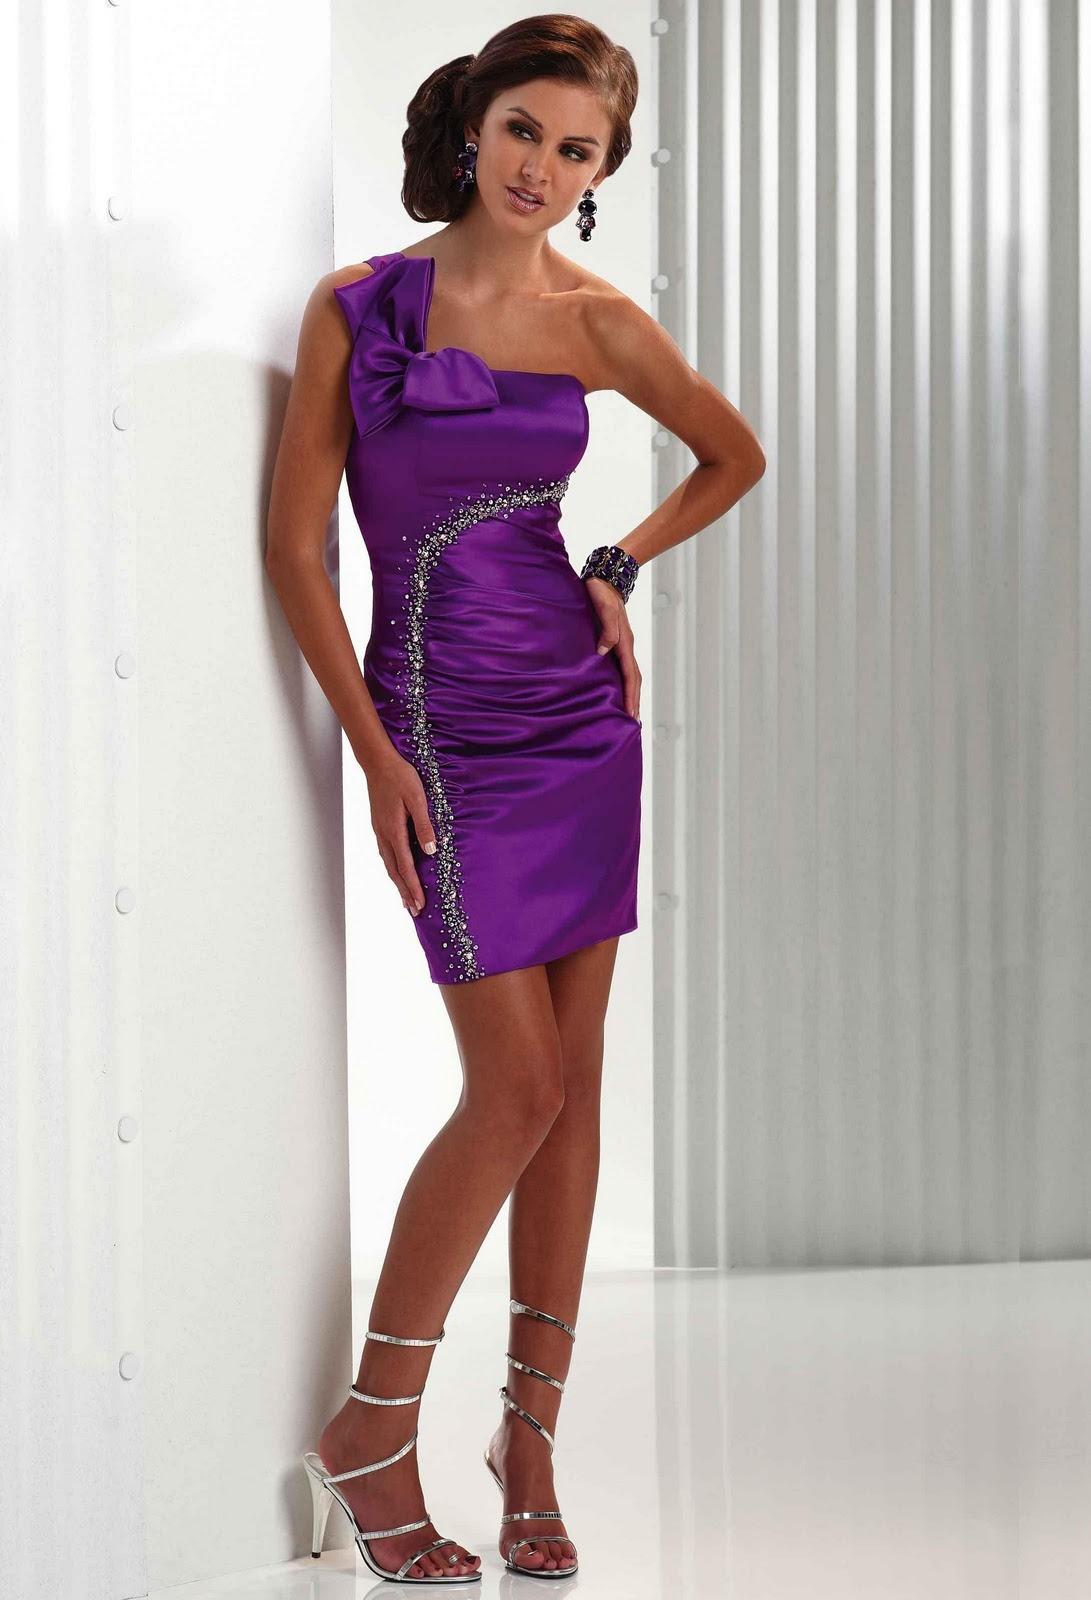 Purple and Black Wedding Dress Designs Ideas